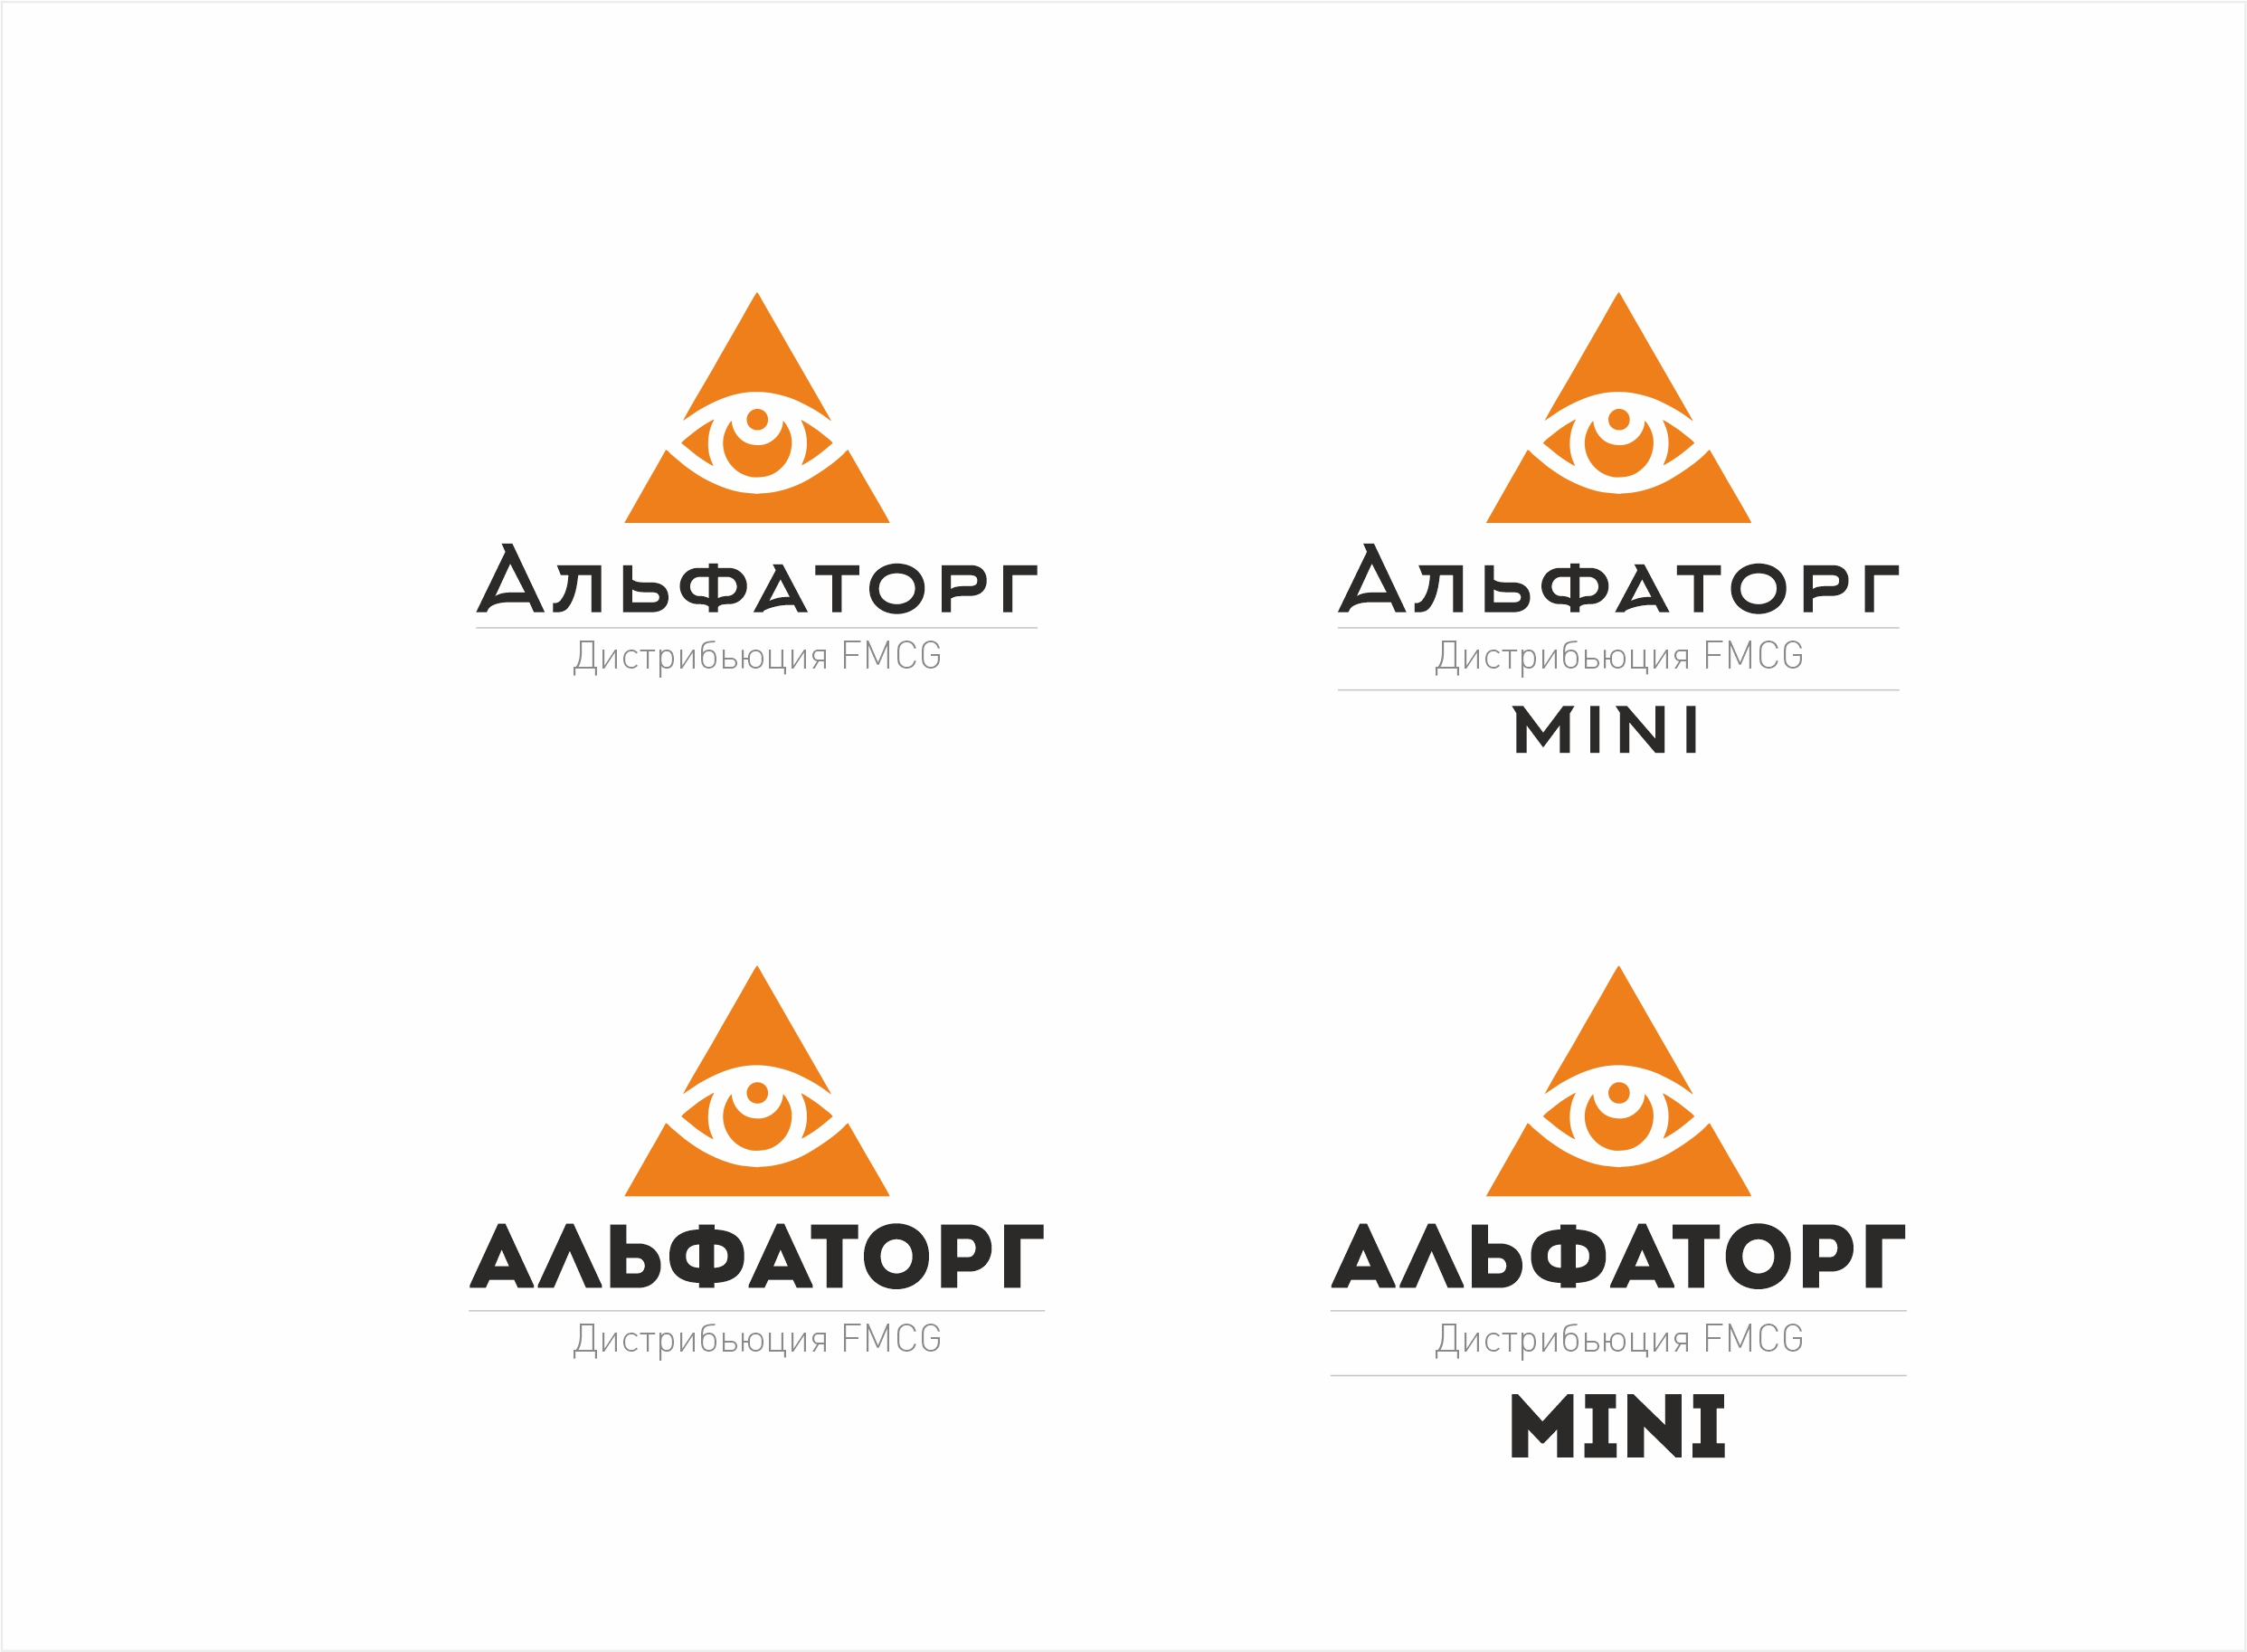 Логотип и фирменный стиль фото f_3475ef9617a36c06.jpg